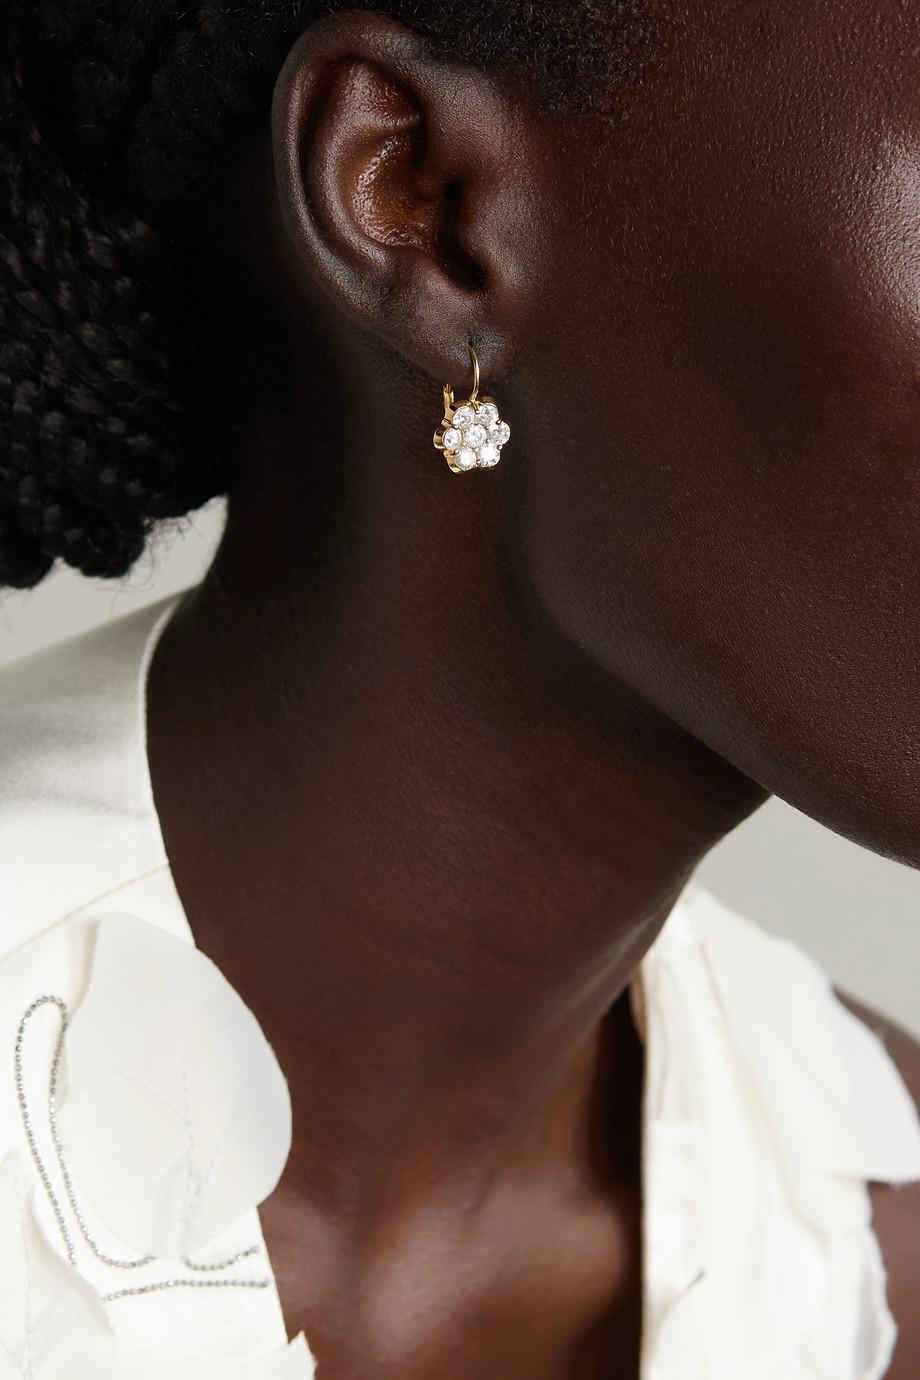 Bayco 18-karat gold diamond earrings